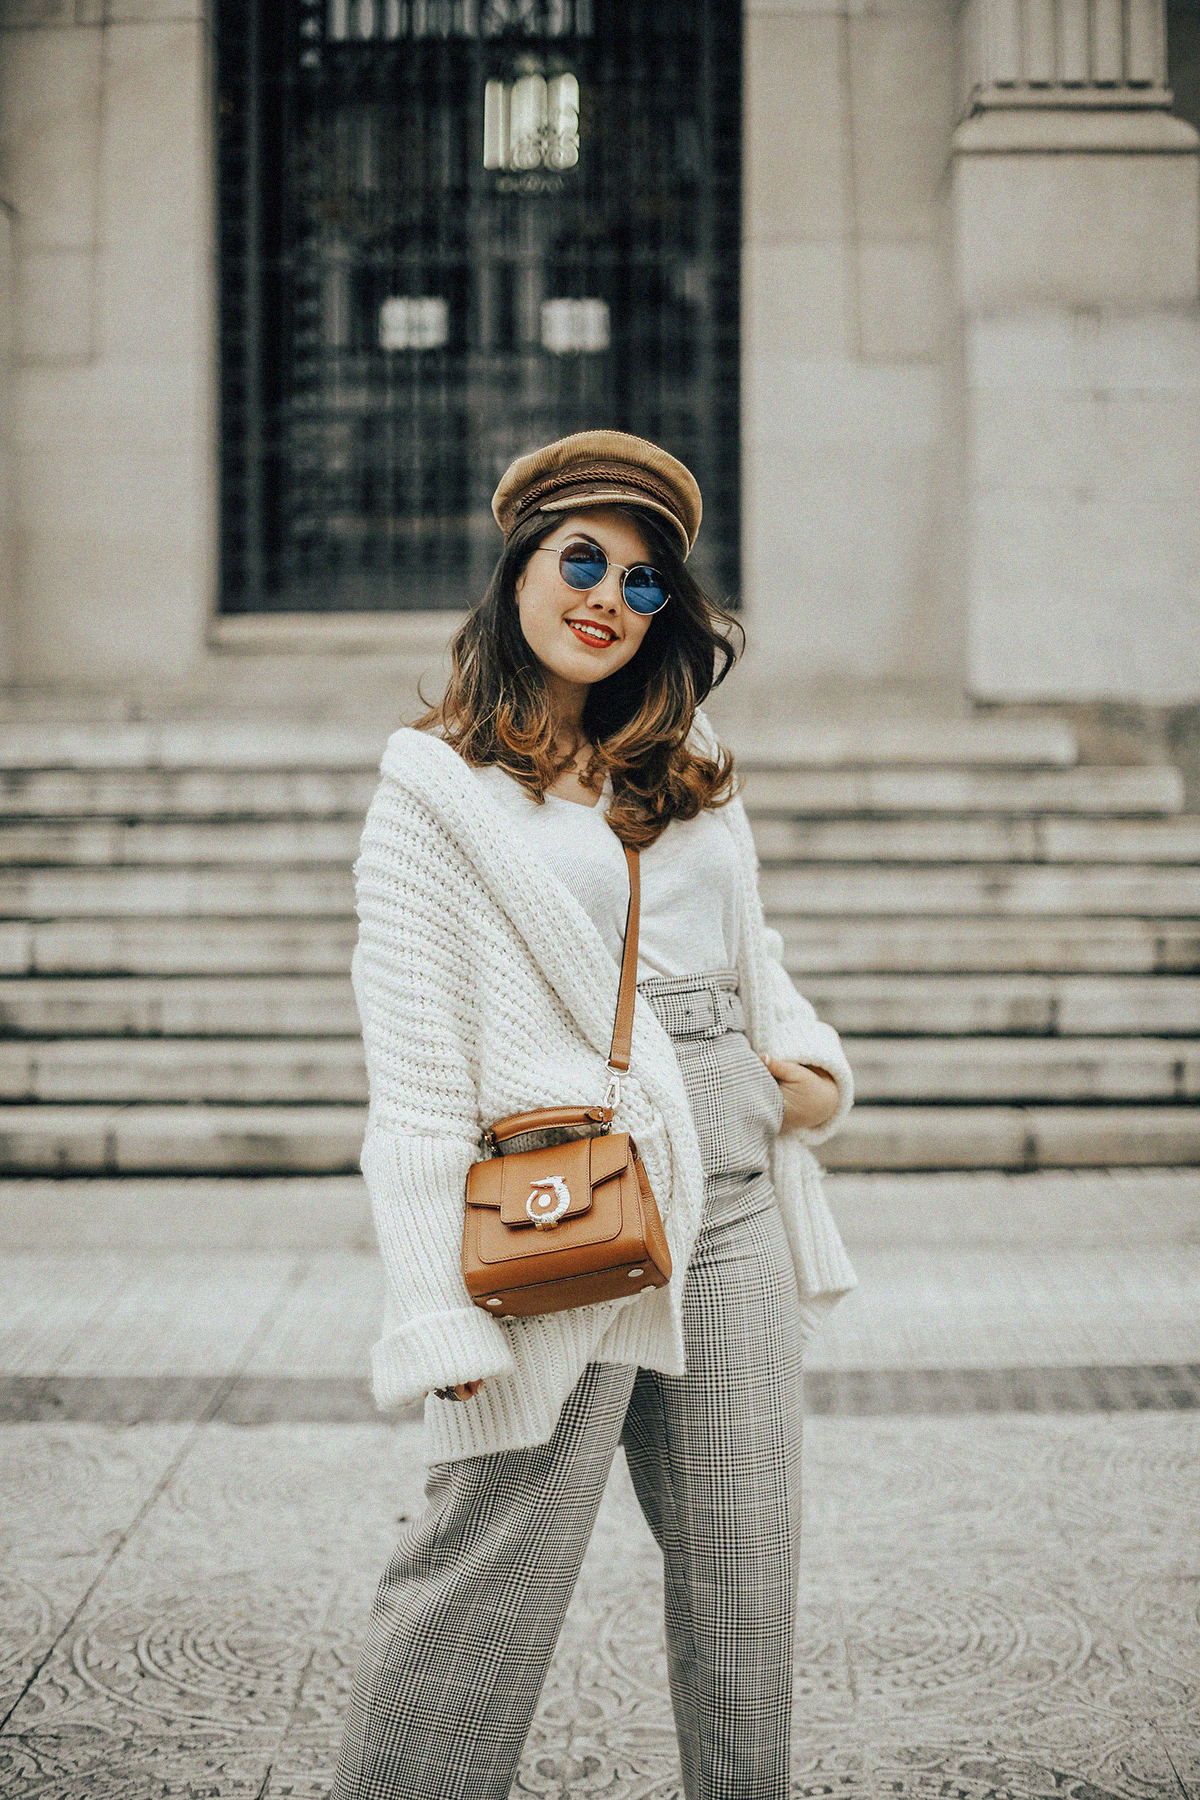 pantalones-cuadros-tiro-alto-streetstyle-trussardi-lovy-bag-myblueberrynightsblog5